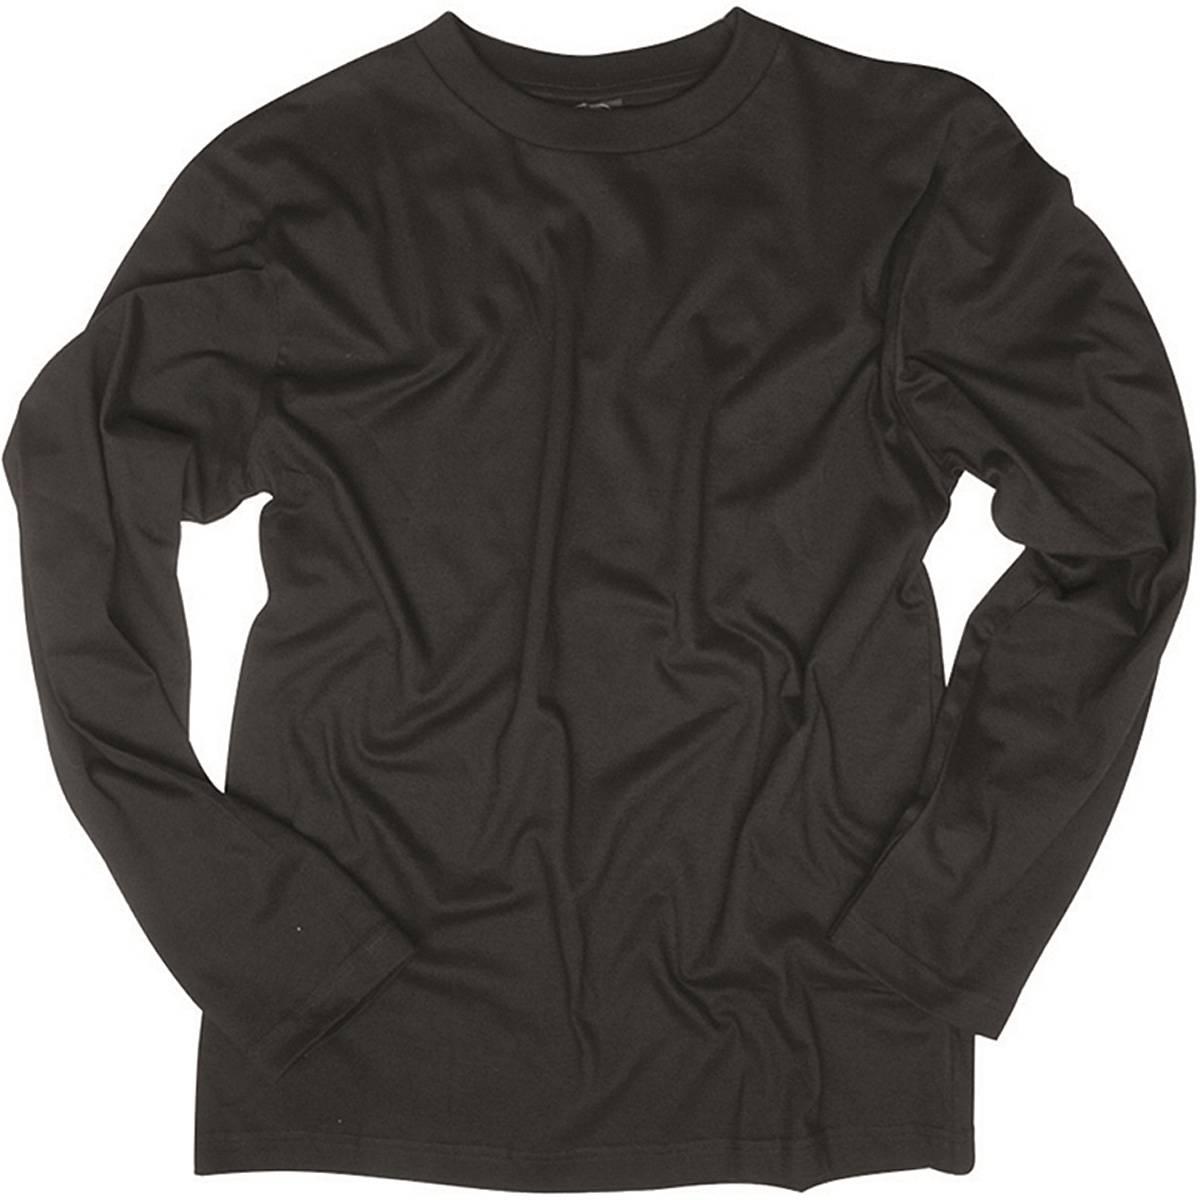 langarmshirt schwarz xxl der gro e bundeswehr shop army shop nato 8 90. Black Bedroom Furniture Sets. Home Design Ideas